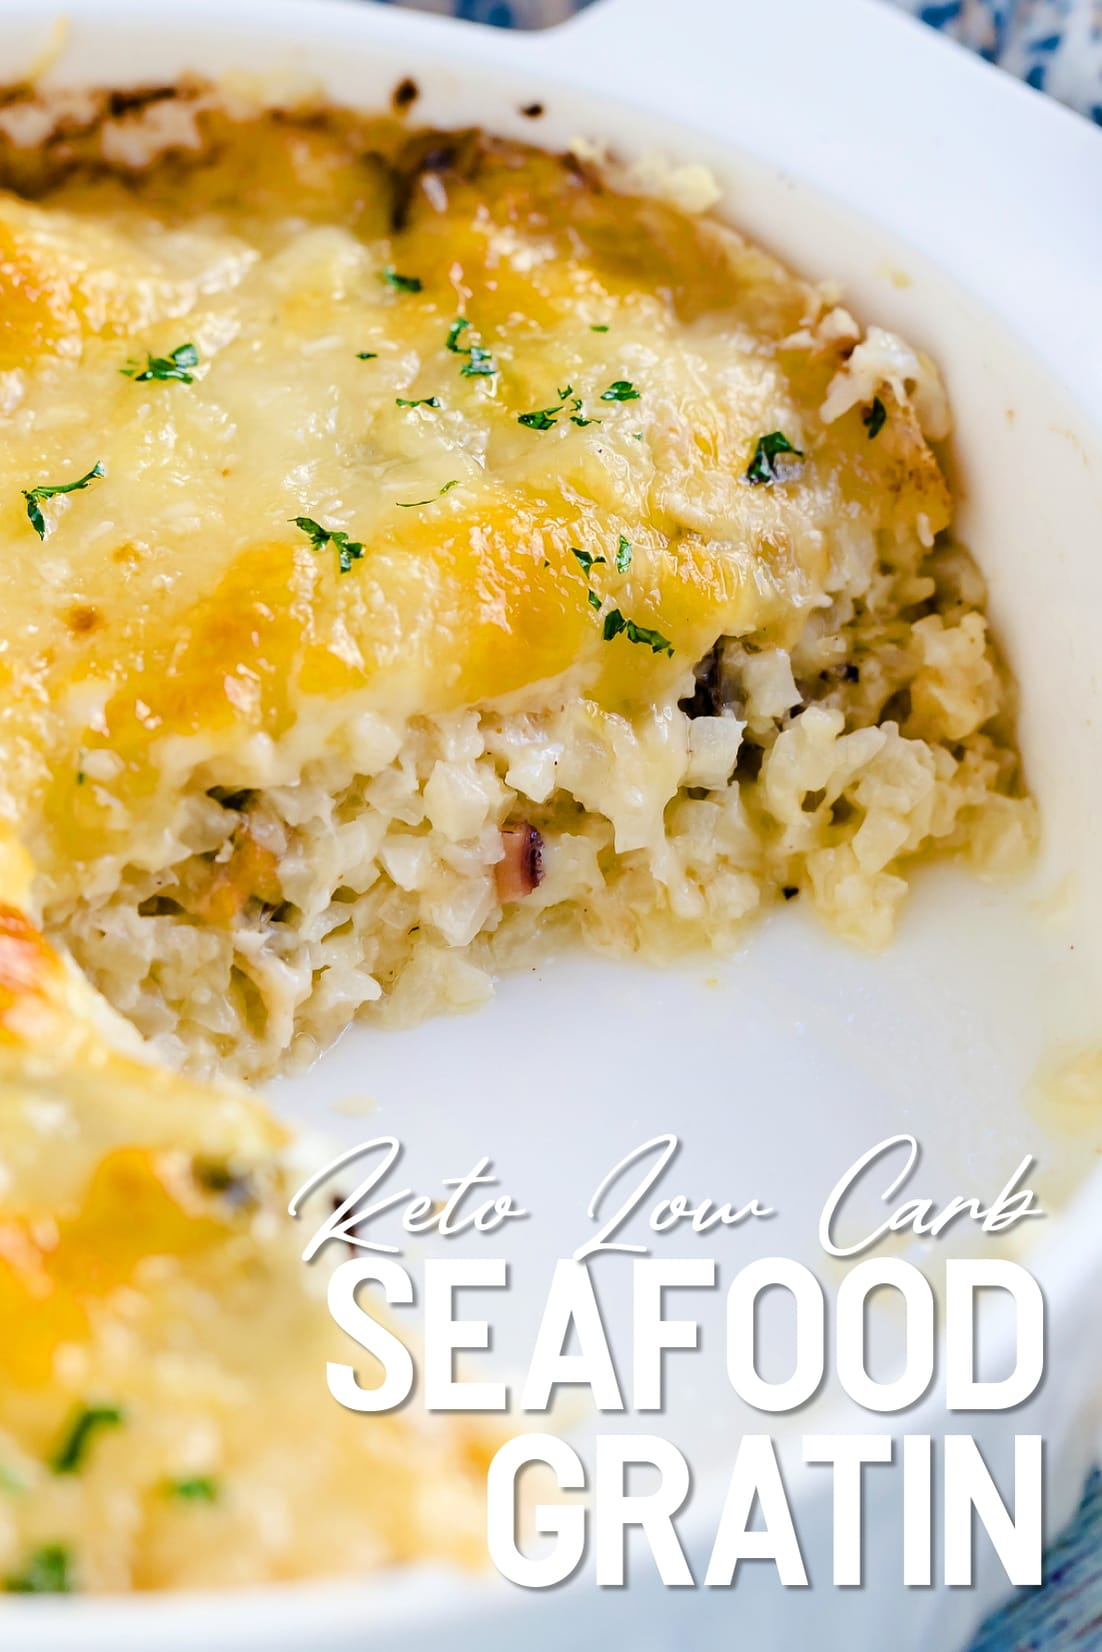 Keto Cauliflower Seafood Gratin showing cross sectional cut